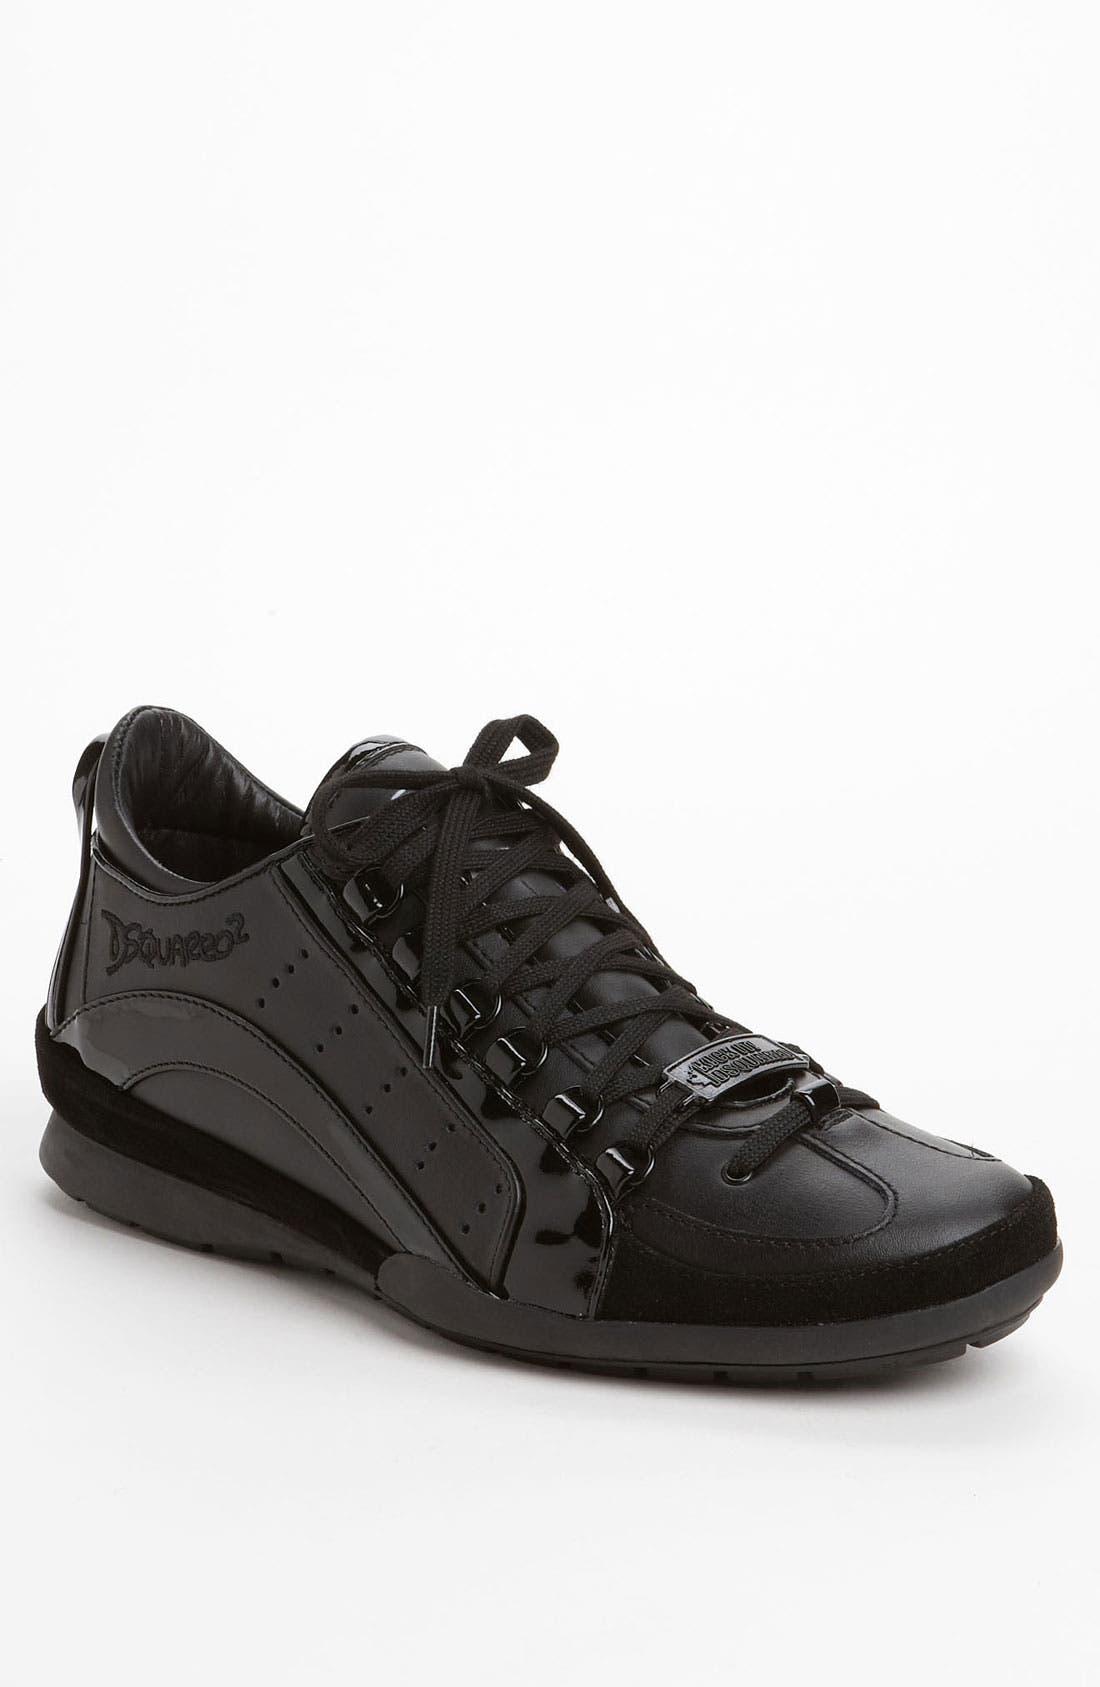 Alternate Image 1 Selected - Dsquared2 '551' Sport Sneaker